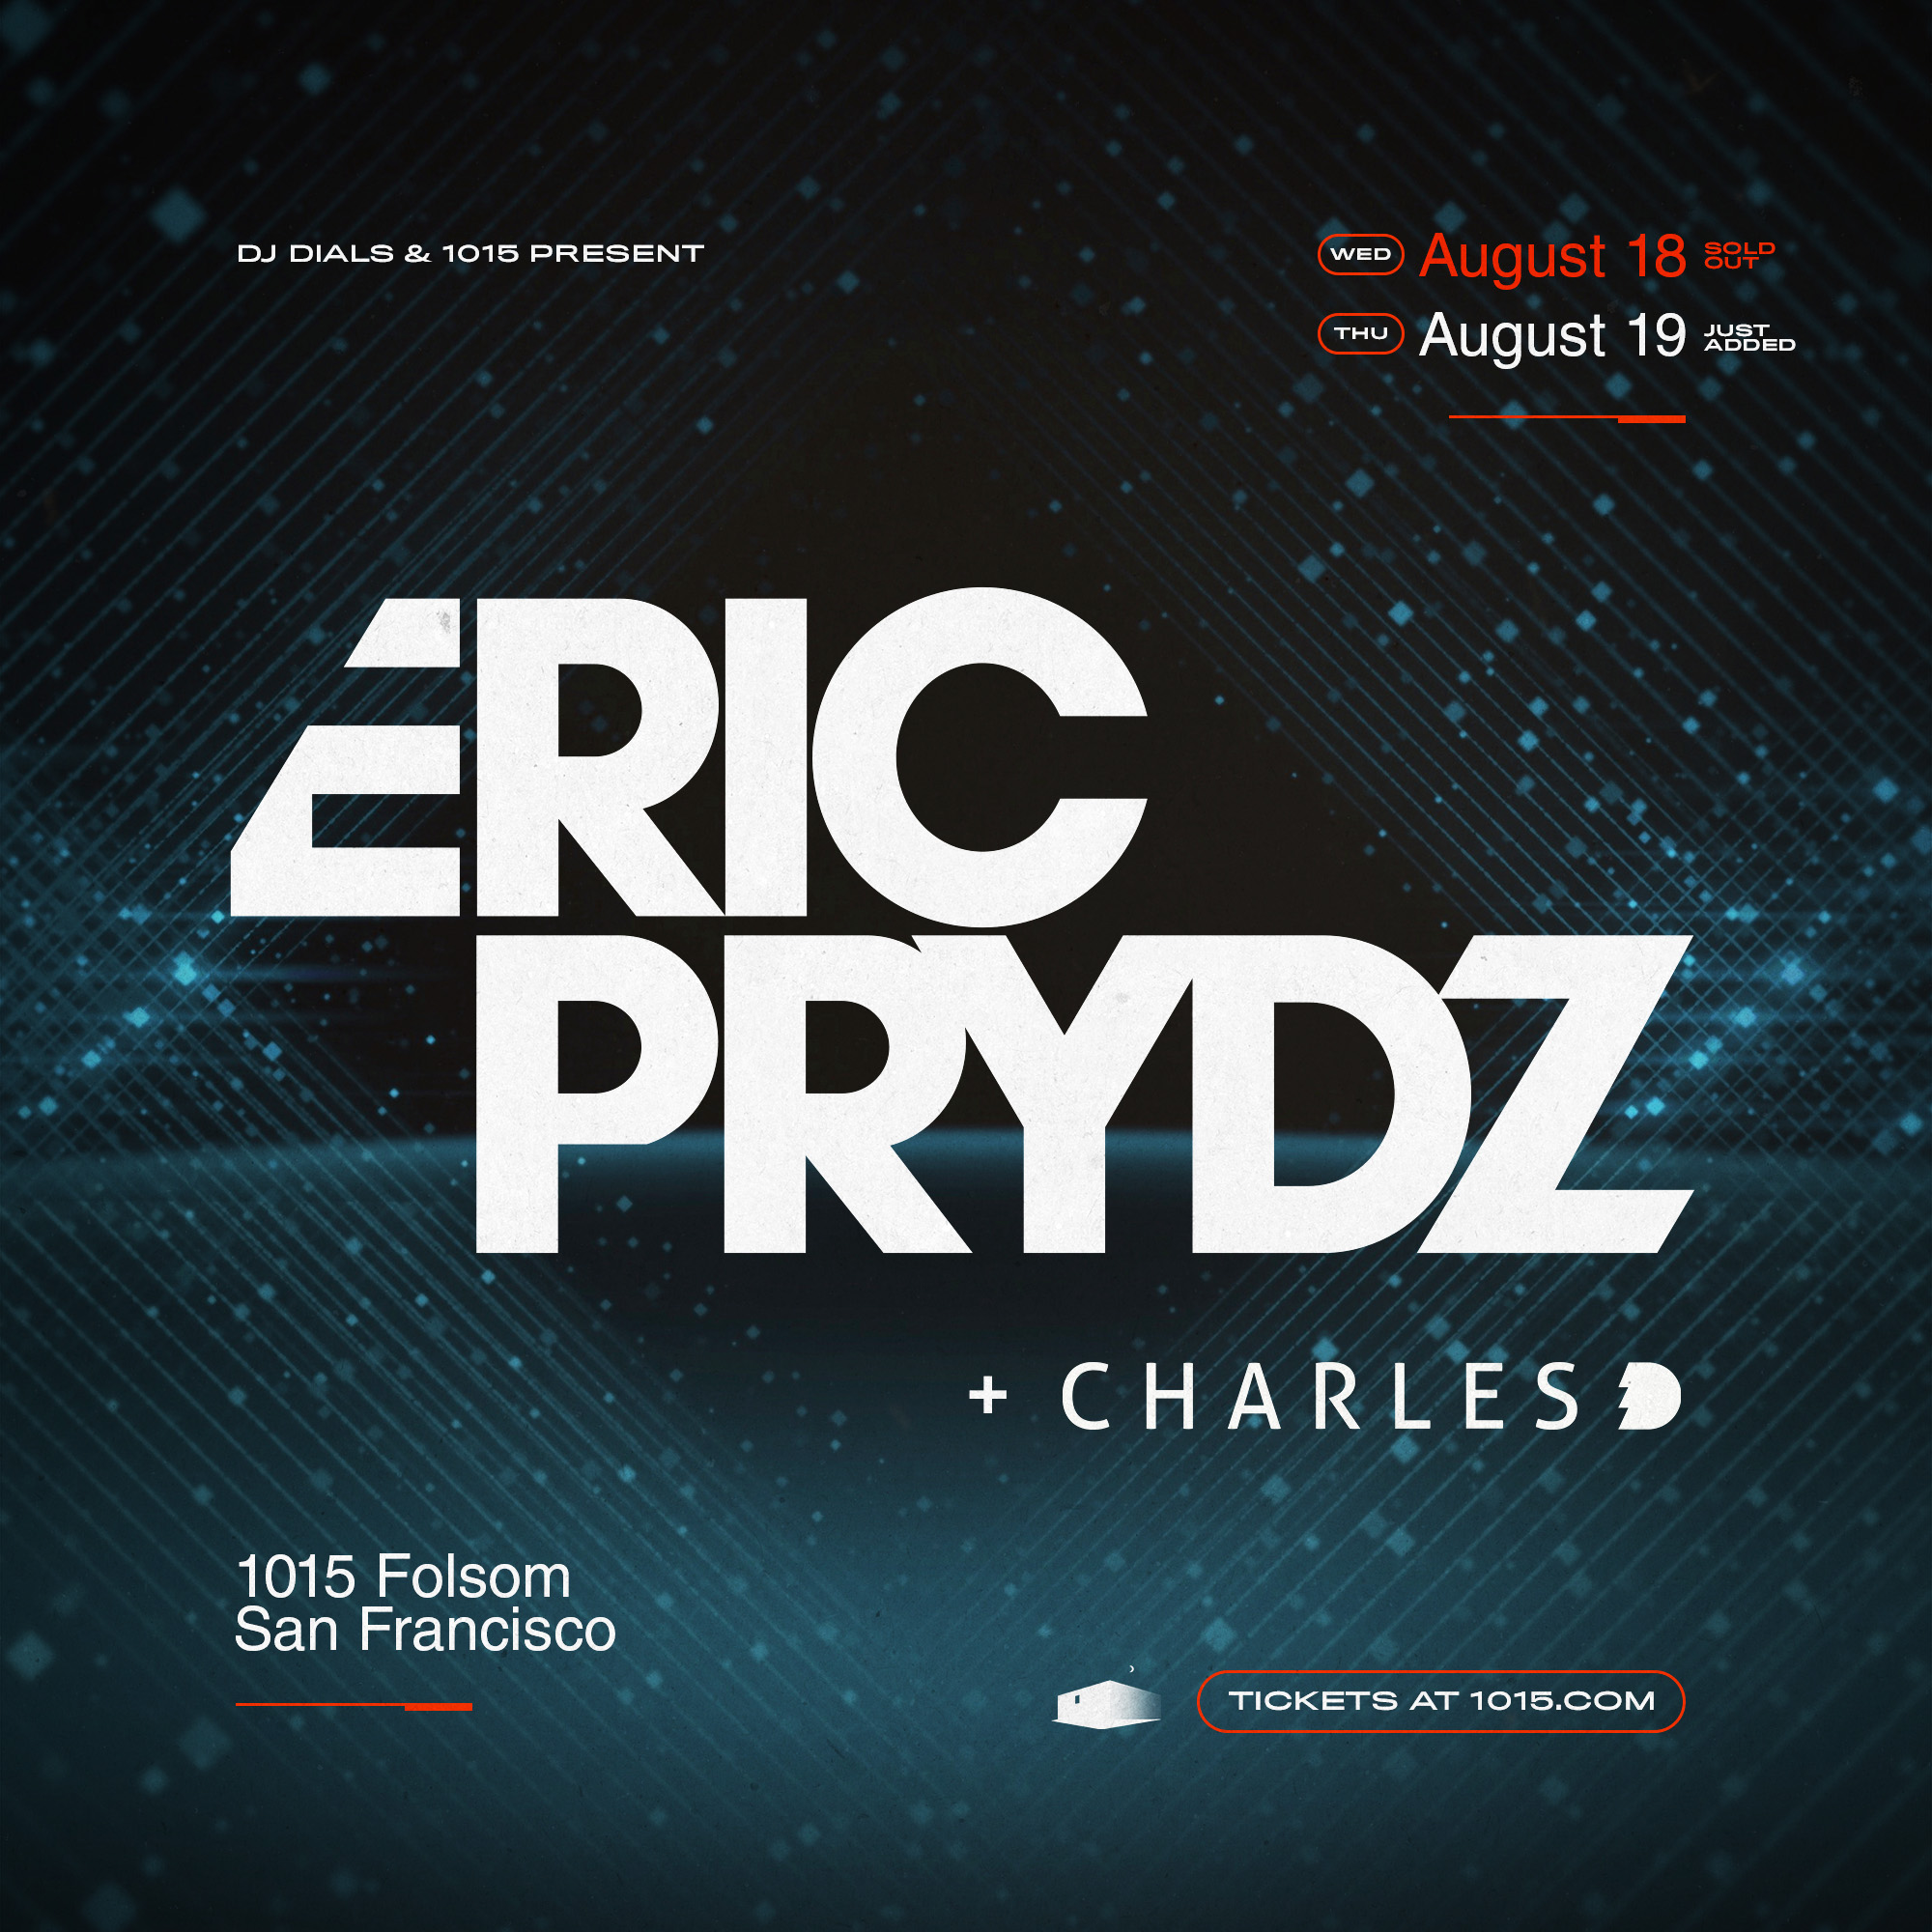 Eric Prydz: